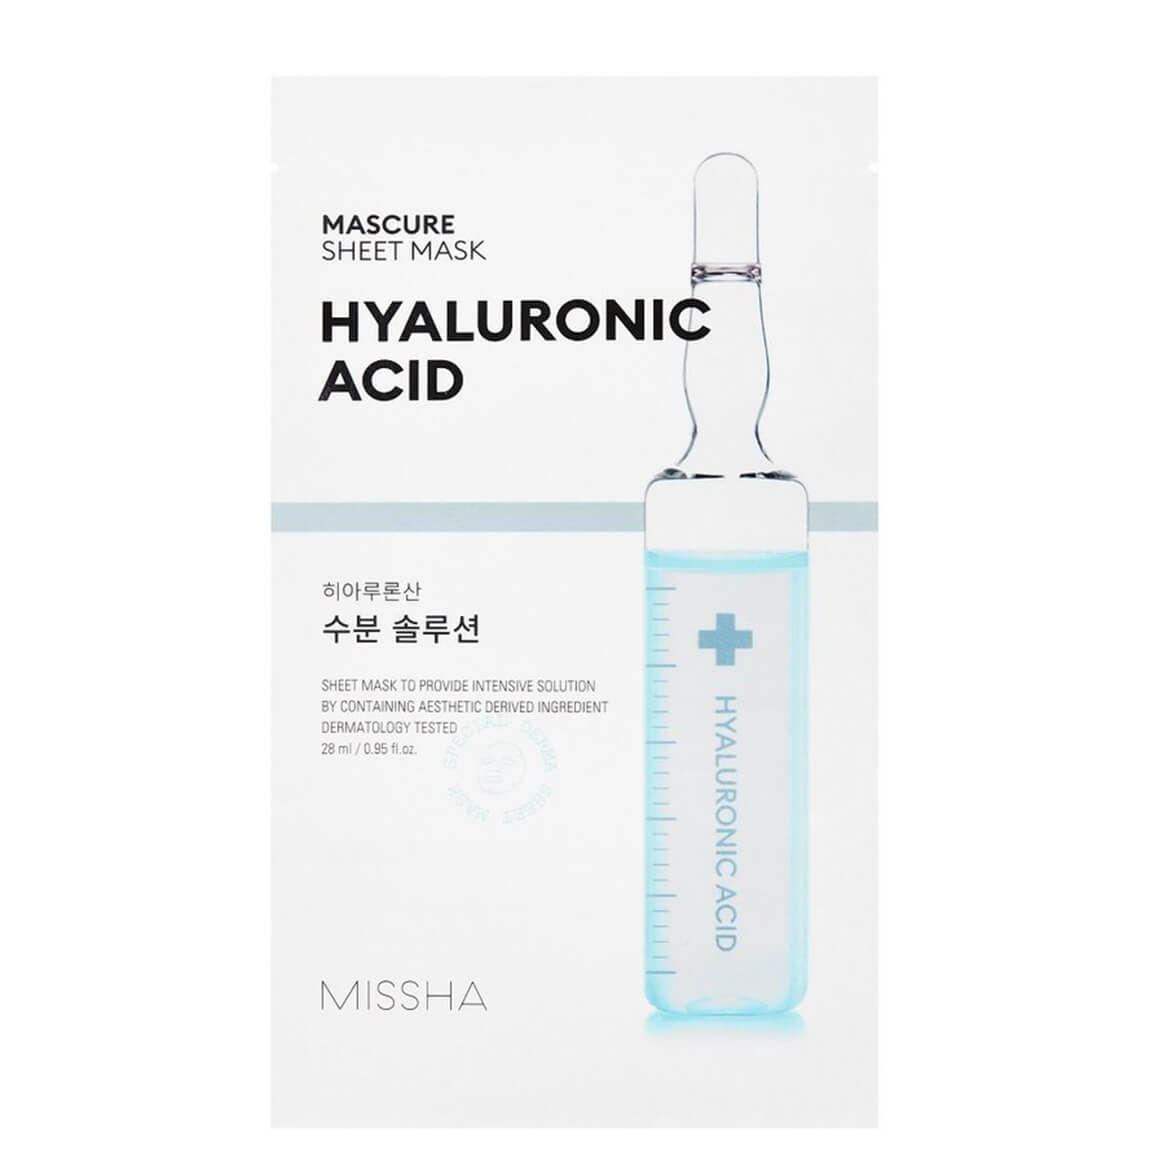 Missha Mascure Hyaluronic Acid Sheet Mask 3pc